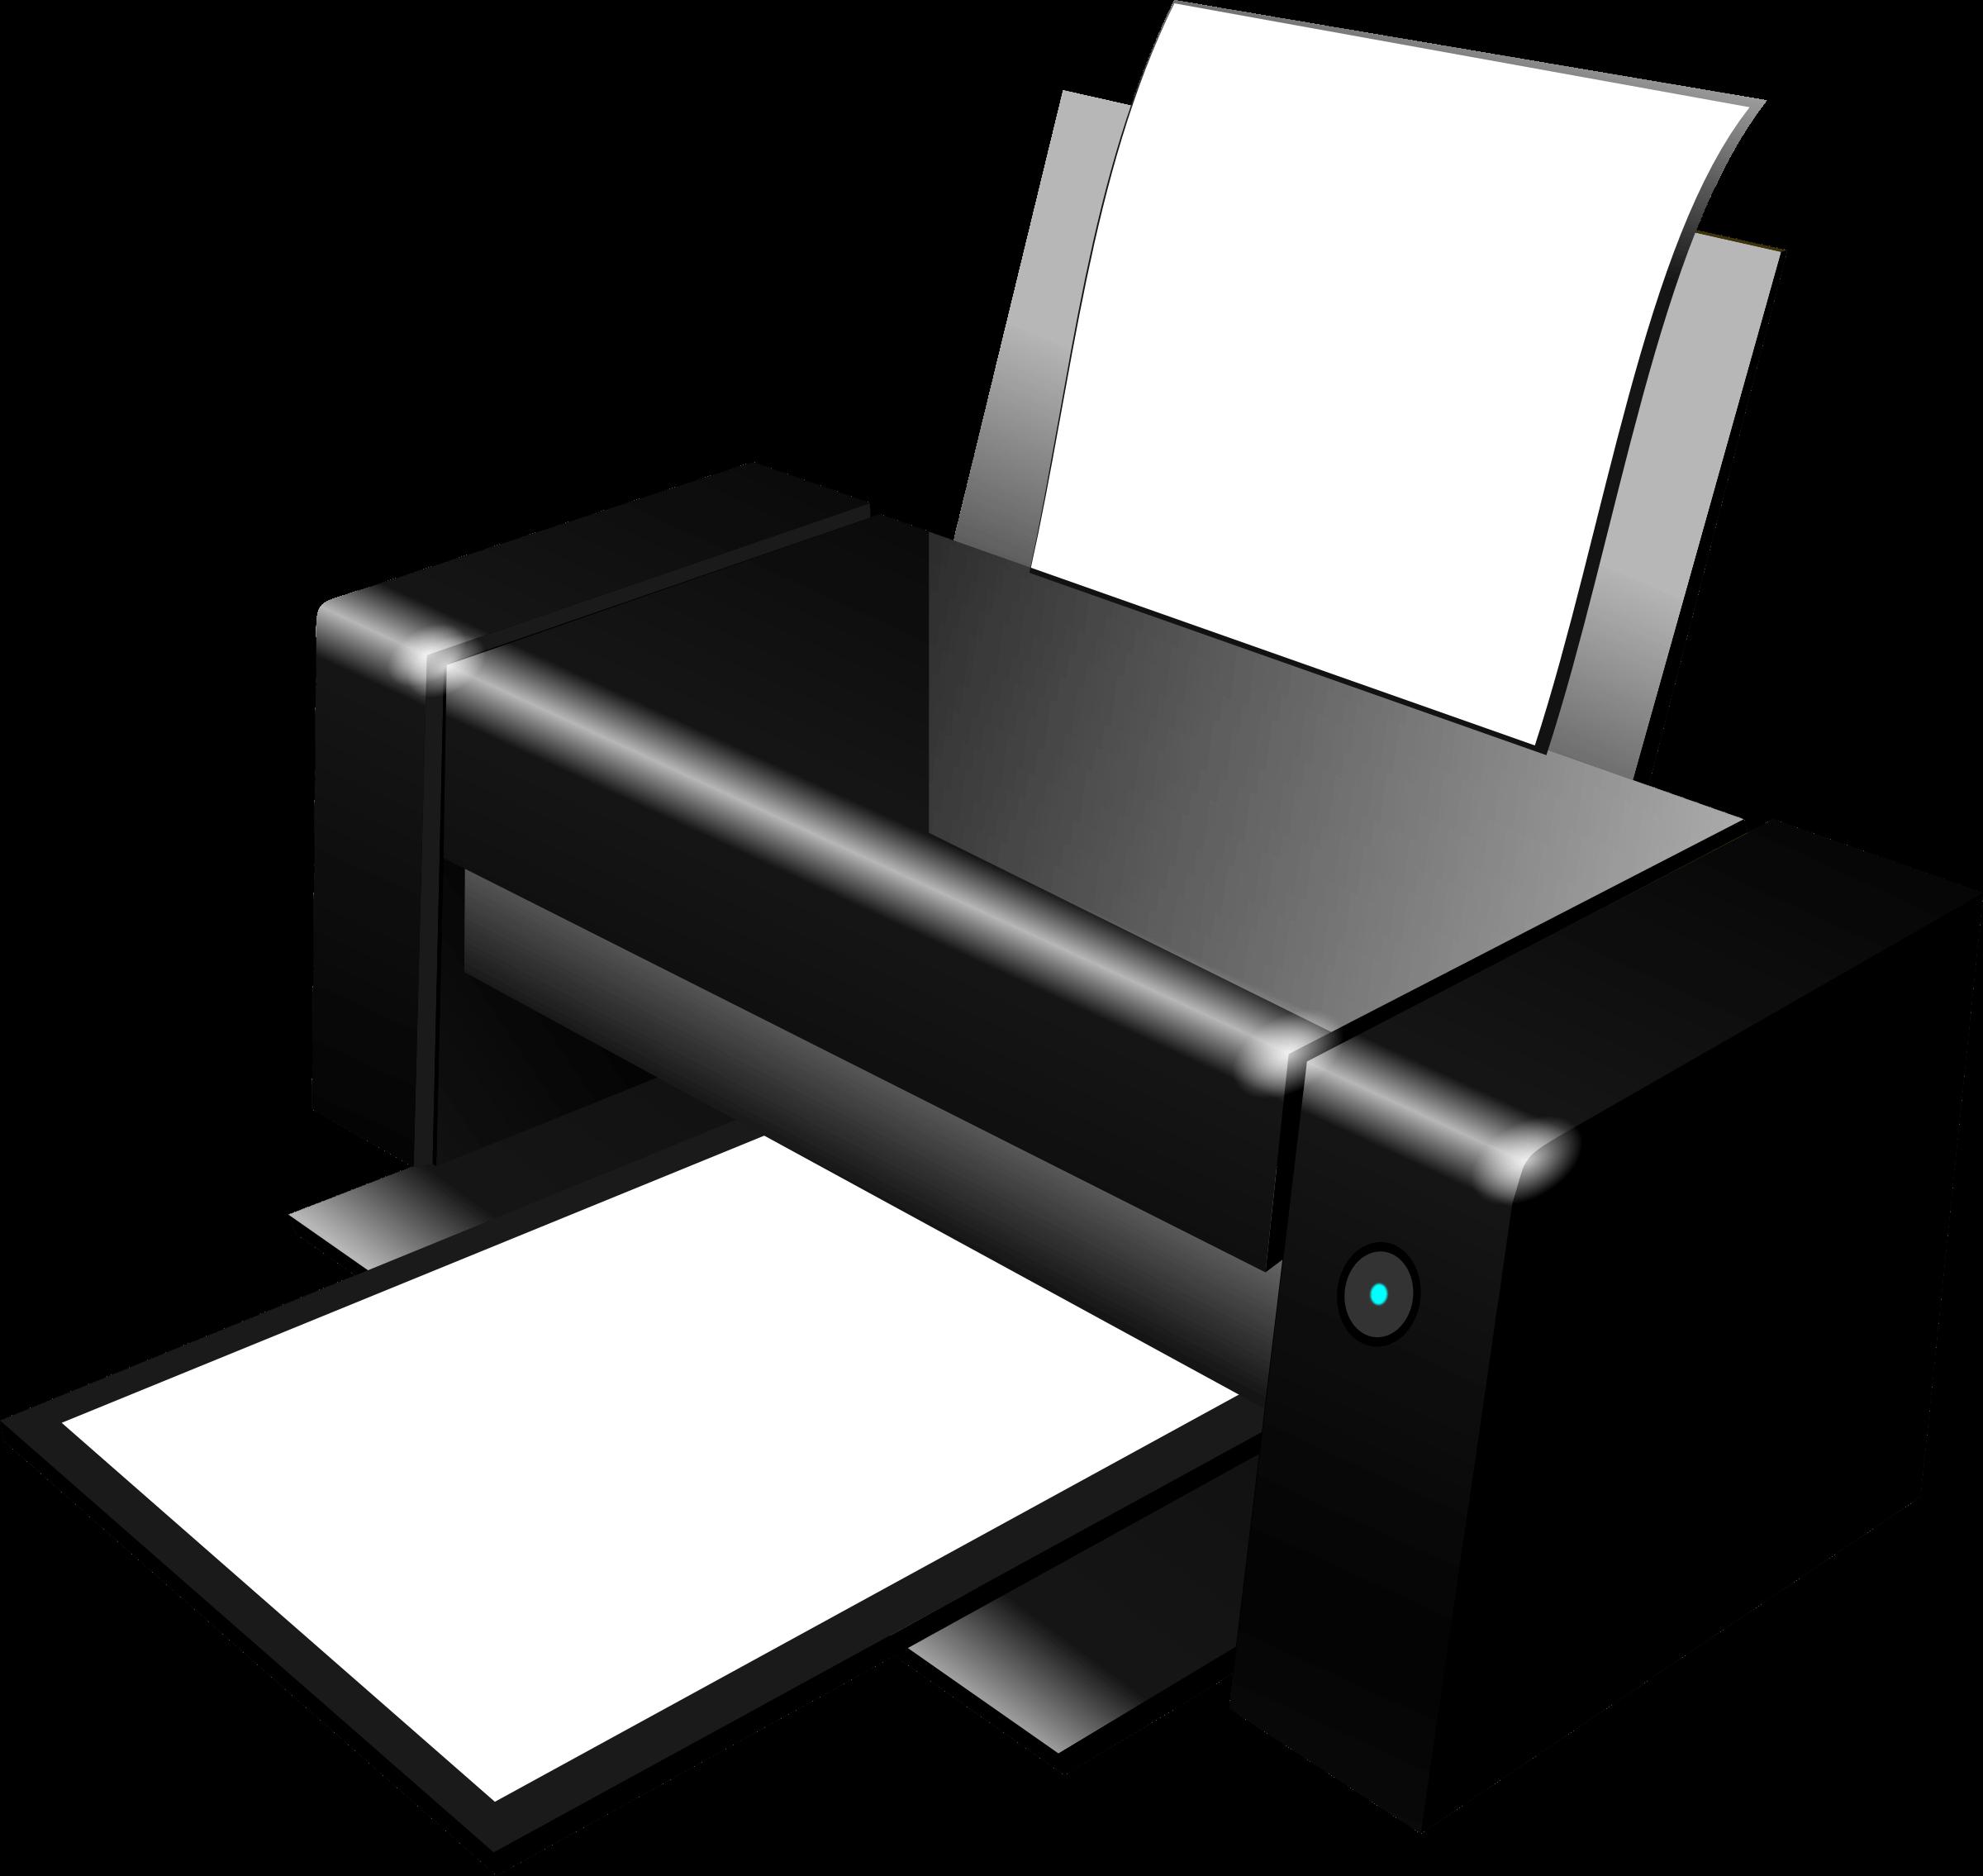 Black Clipart Printer transparent PNG.